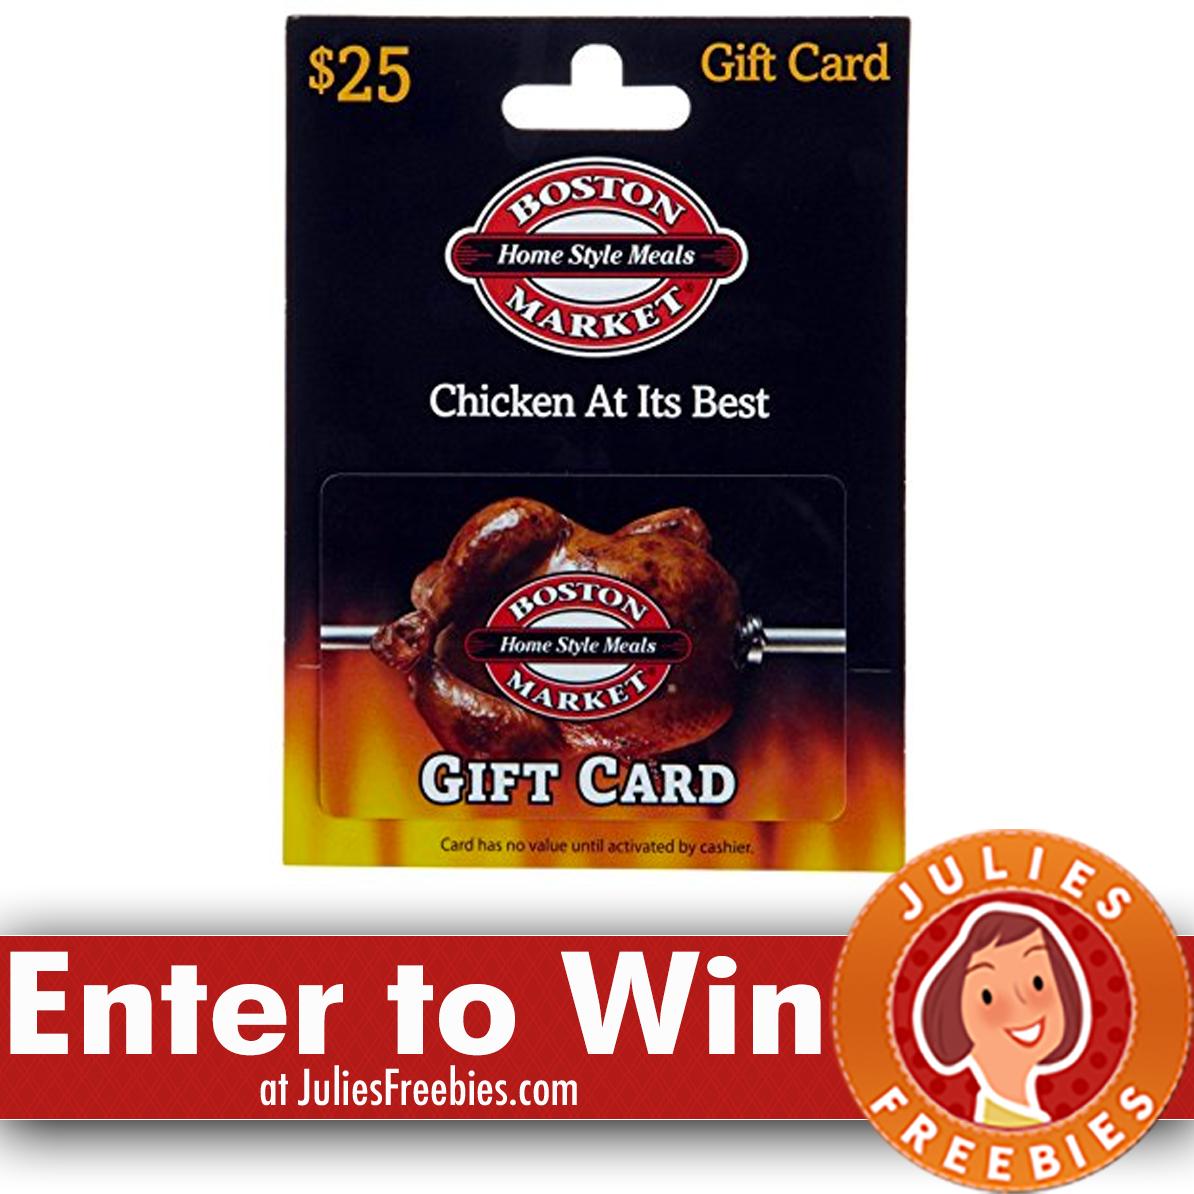 Win A $50 Boston Market Gift Card